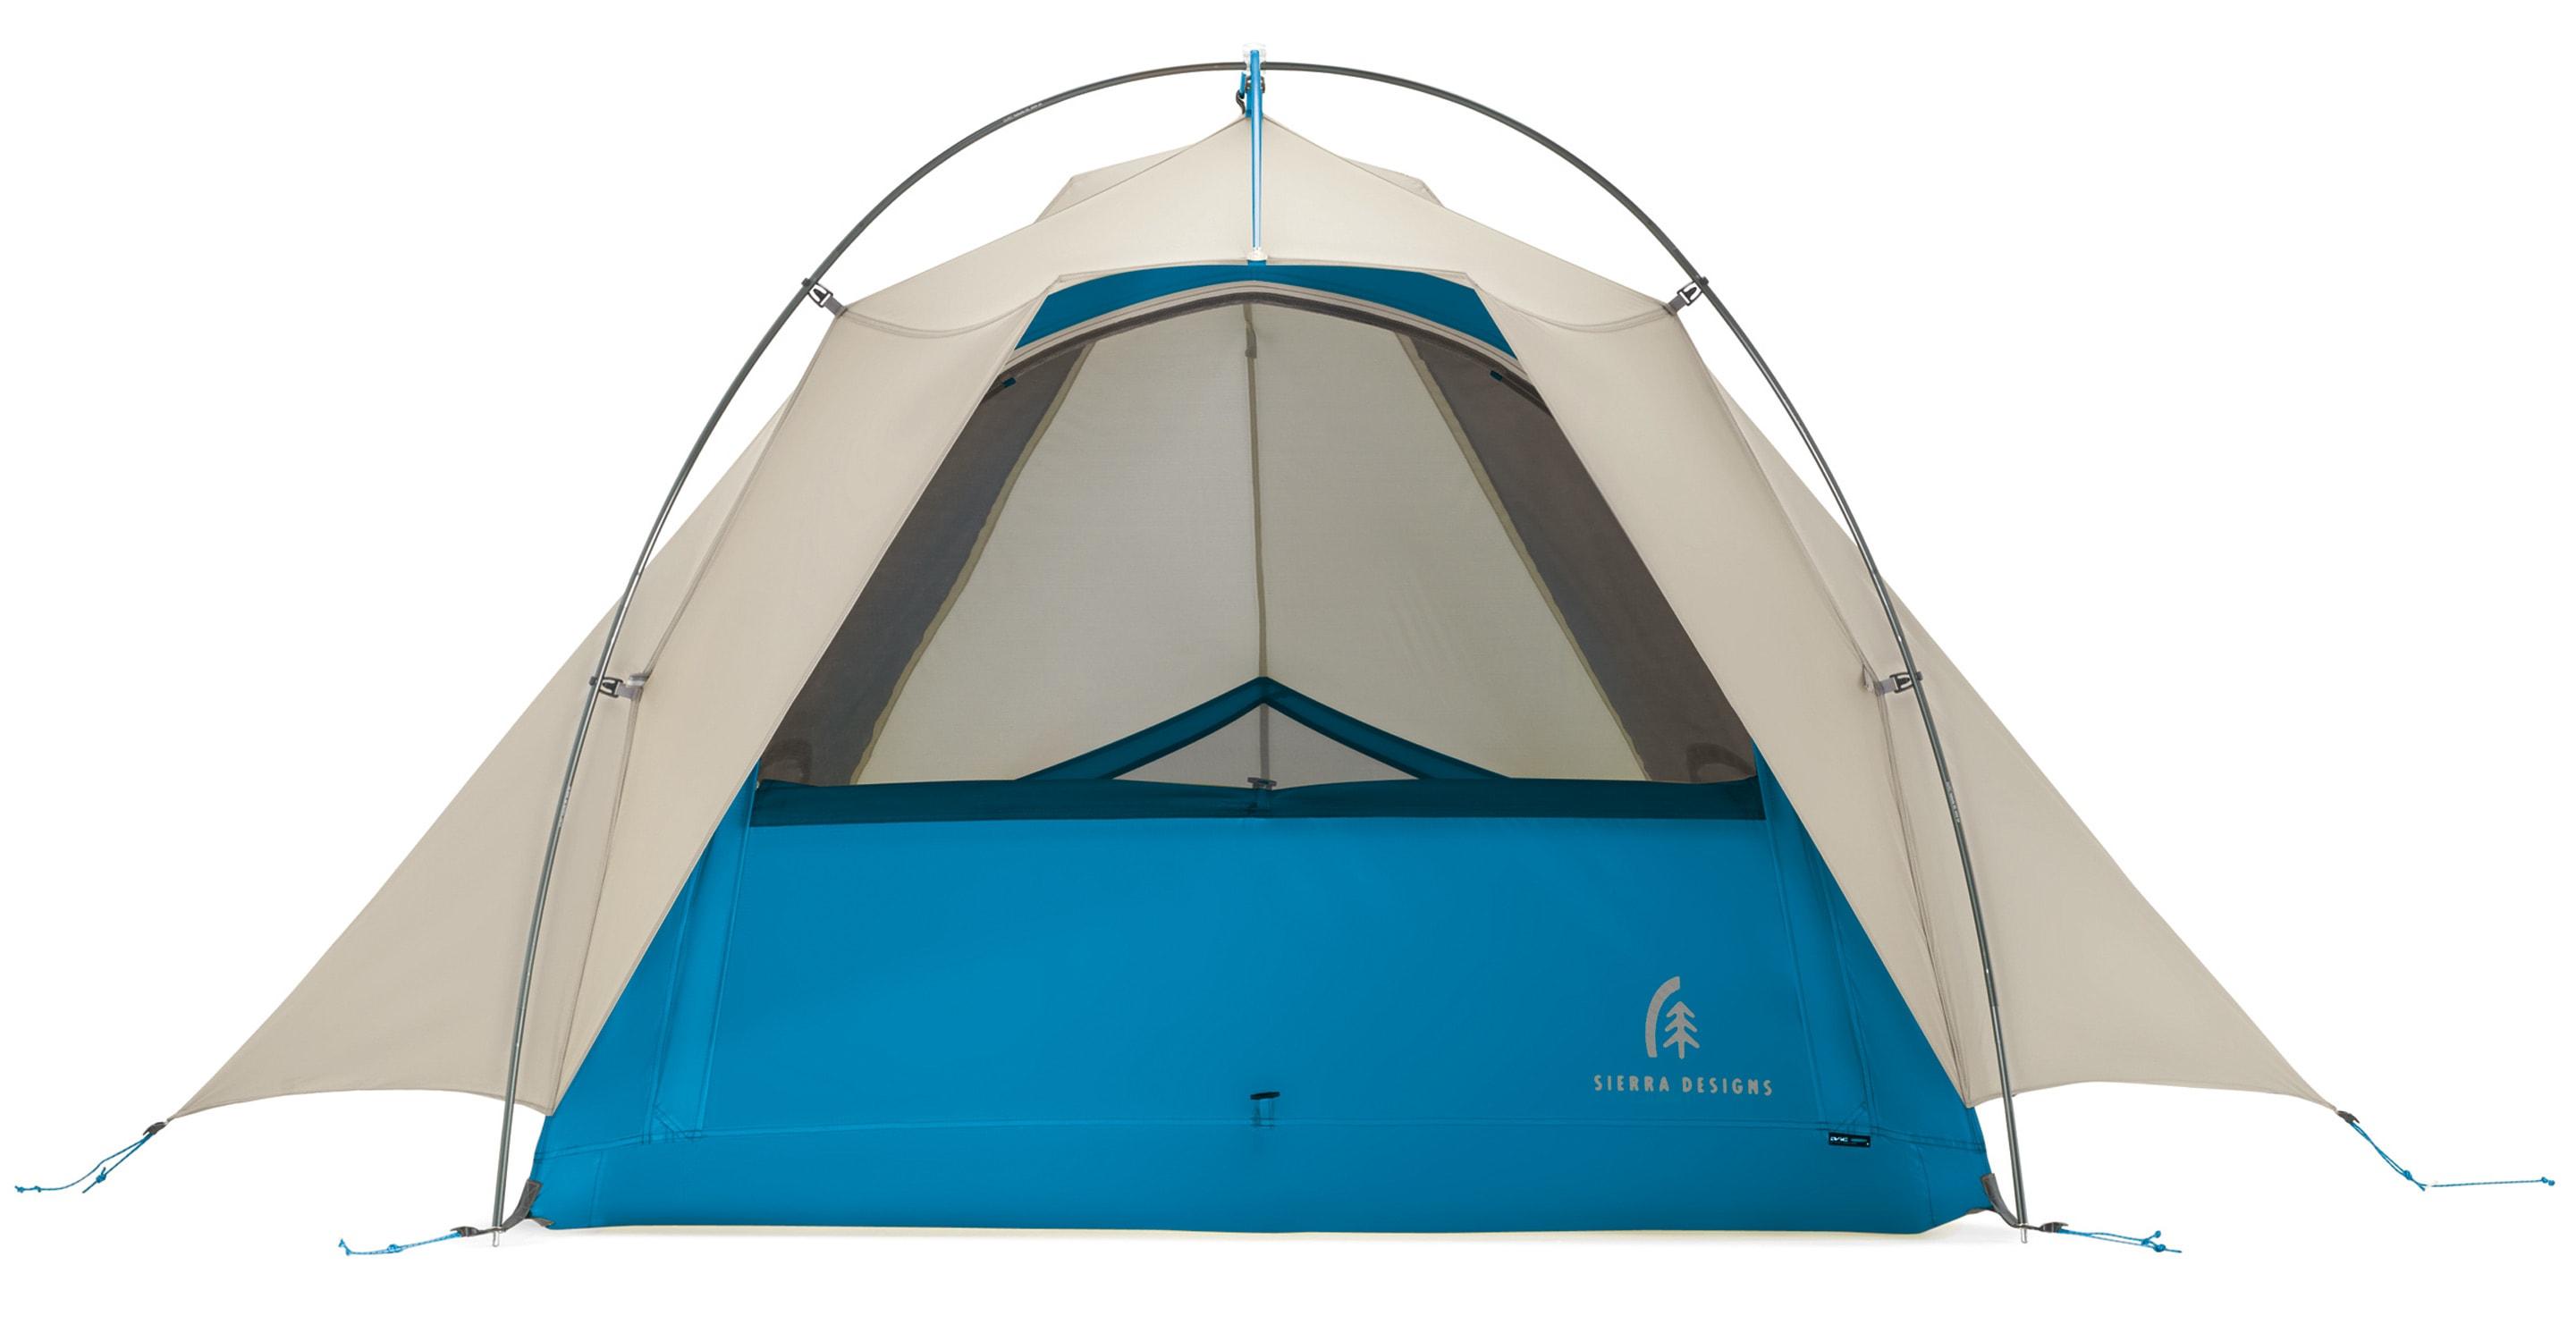 Sierra Designs Lightning 2 Tent - thumbnail 1  sc 1 st  The House & On Sale Sierra Designs Lightning 2 Tent up to 55% off